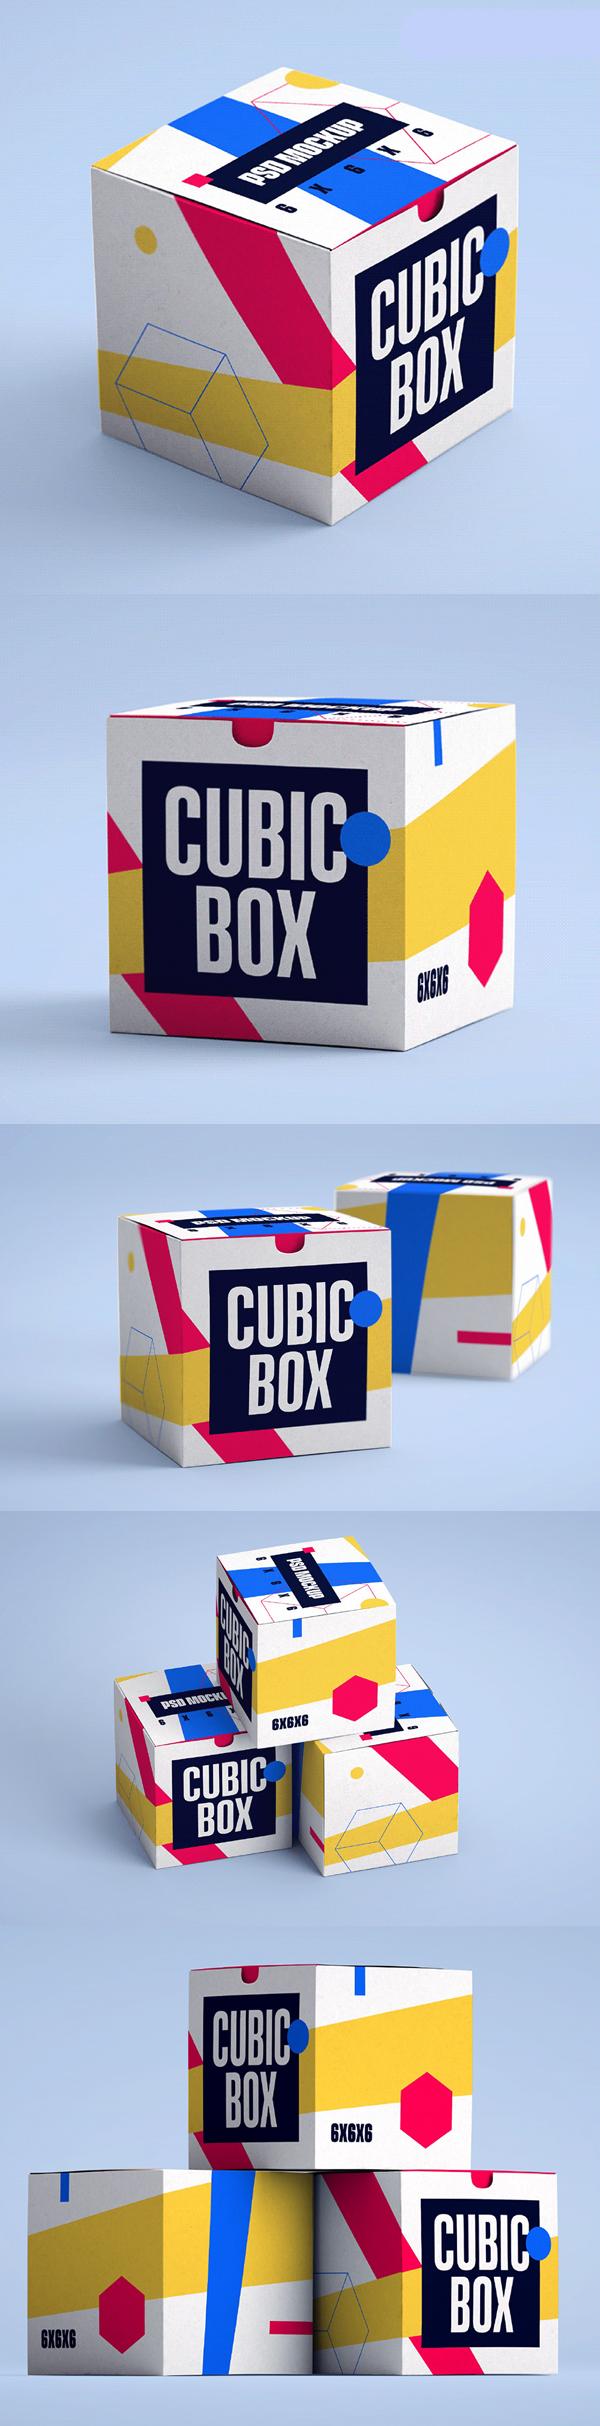 Free Cubic Box Mockups